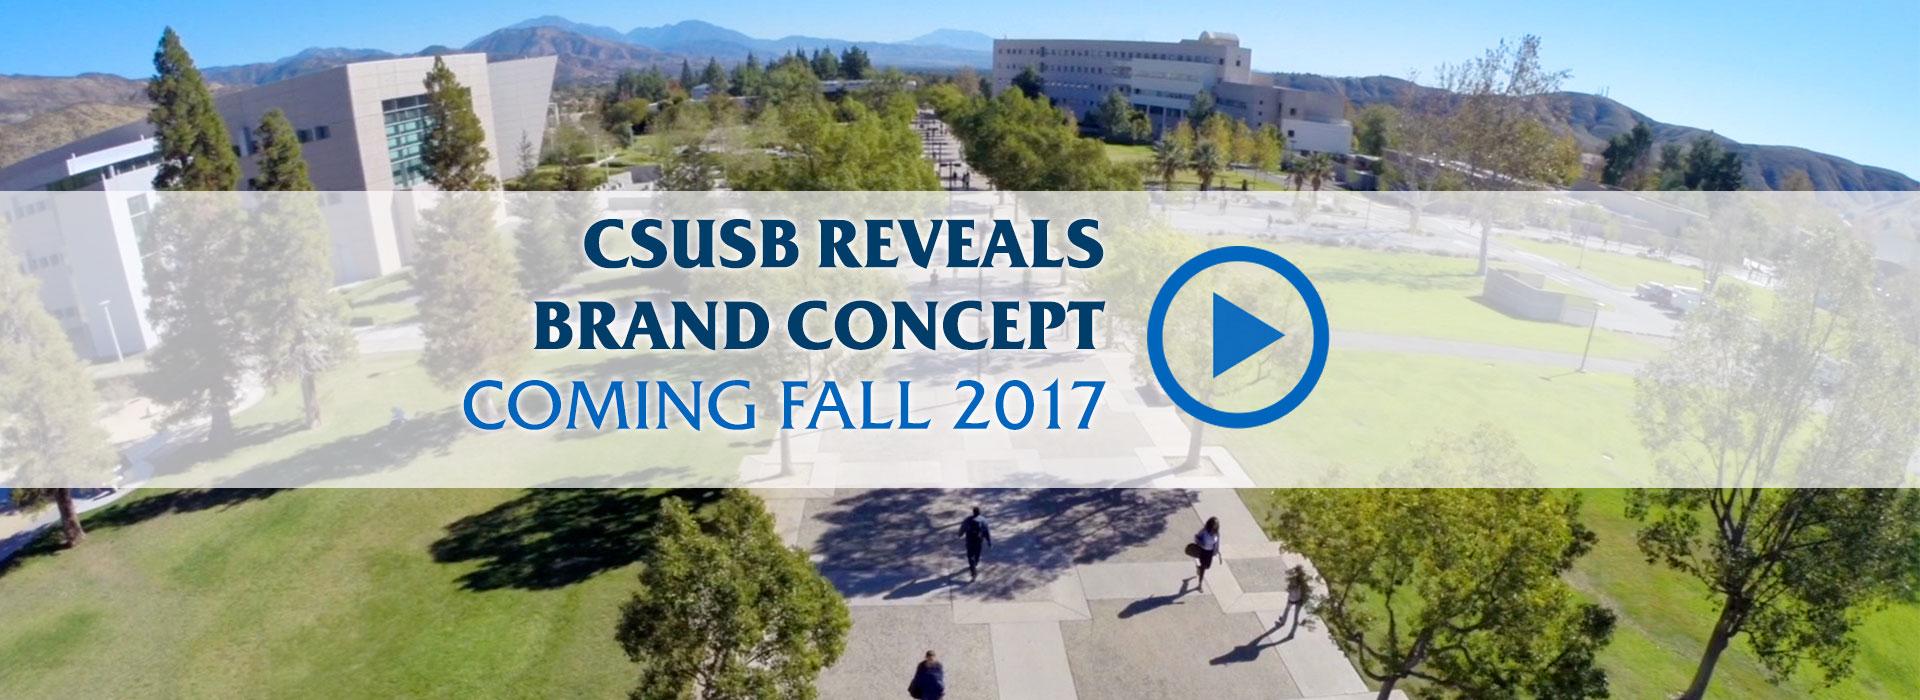 CSUSB Reveals Brand Concept — Coming Fall 2017